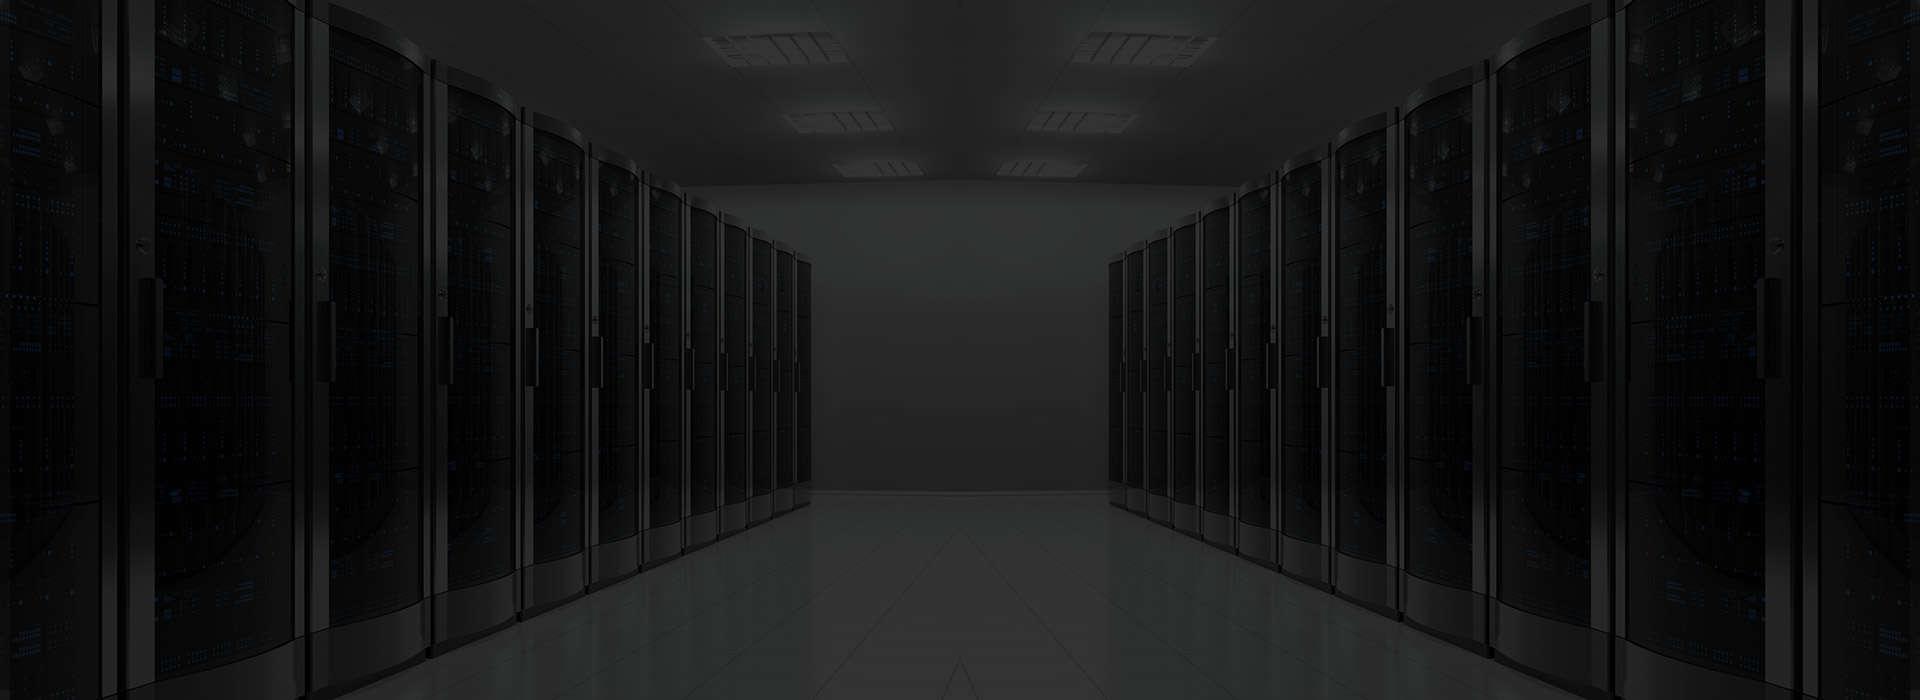 servizi di assistenza pc, notebook recupero dati reballing , siti web